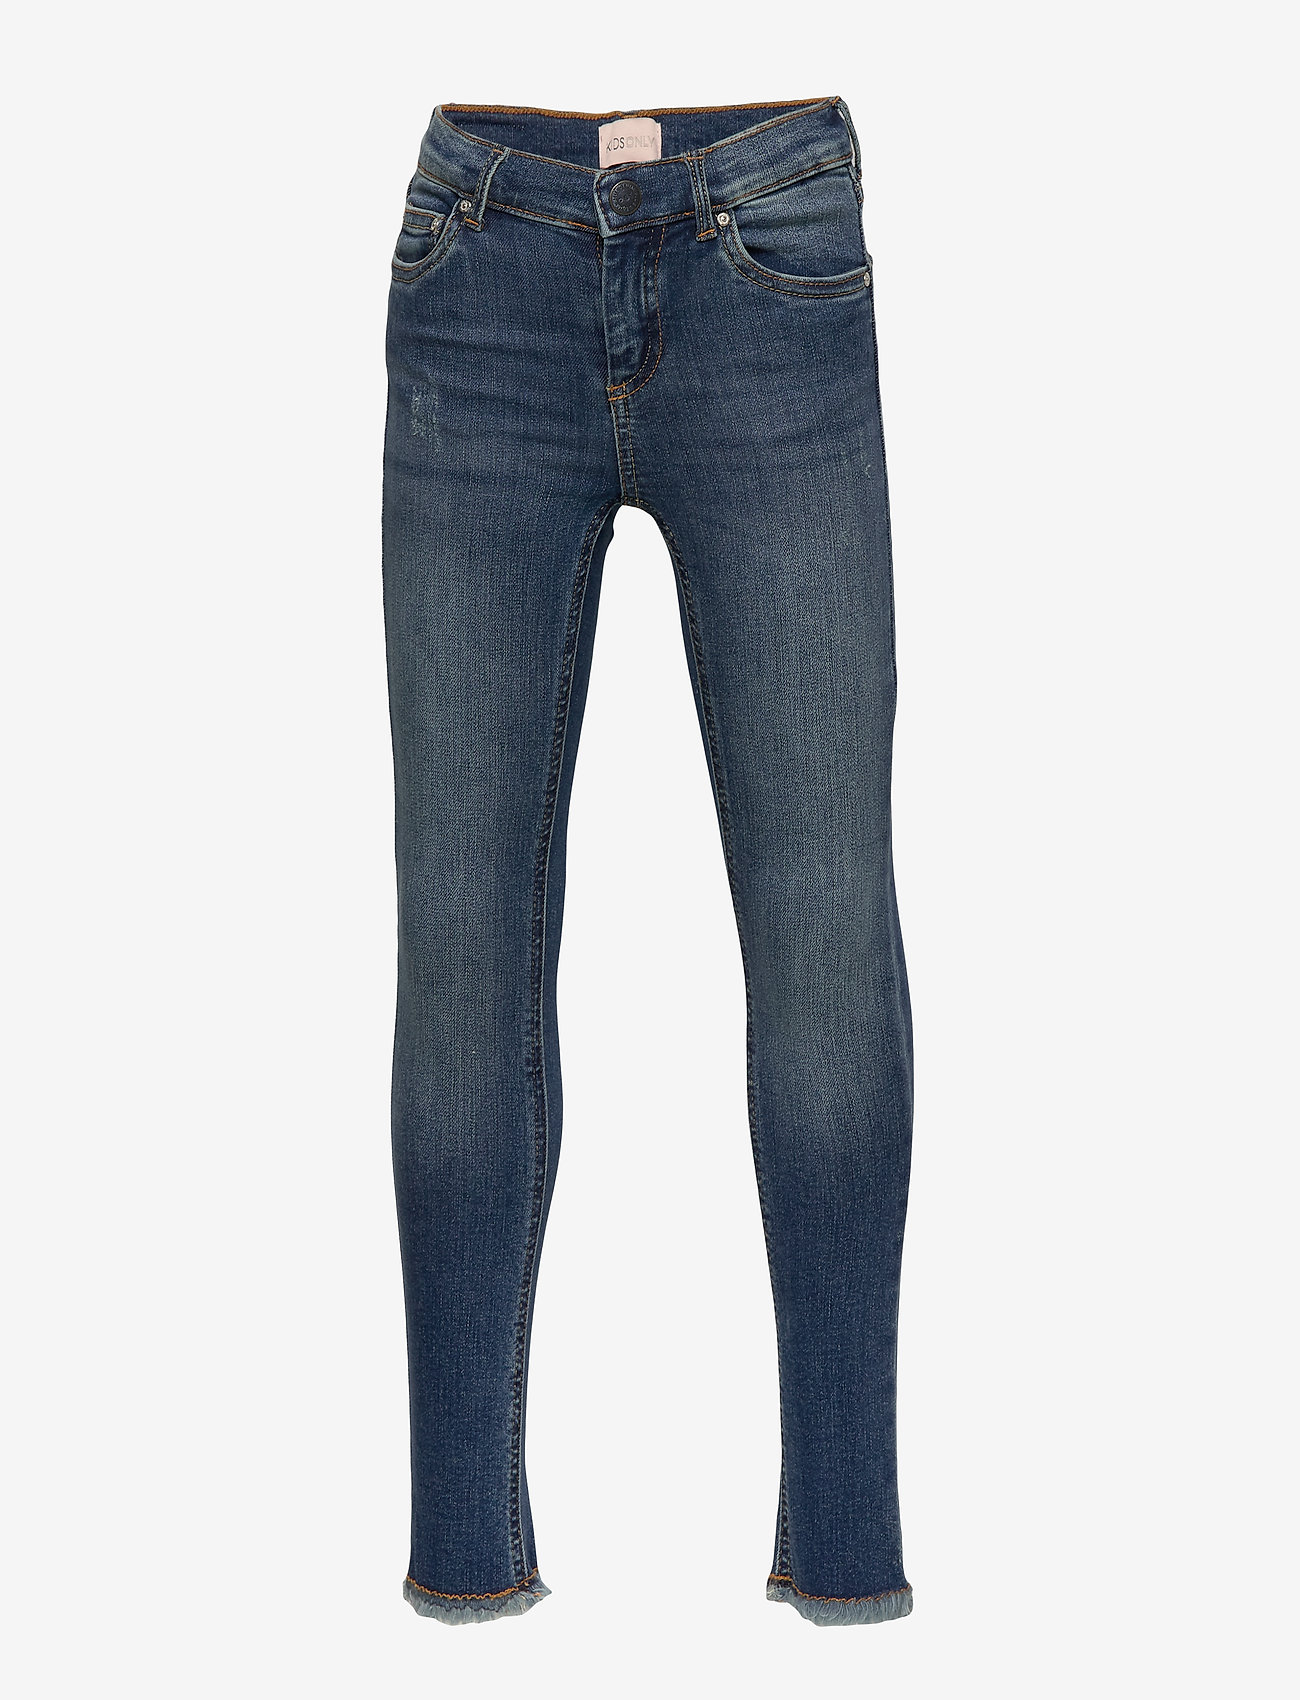 Kids Only - KONBLUSH SKINNY RAW JEANS 1303 NOOS - jeans - medium blue denim - 0